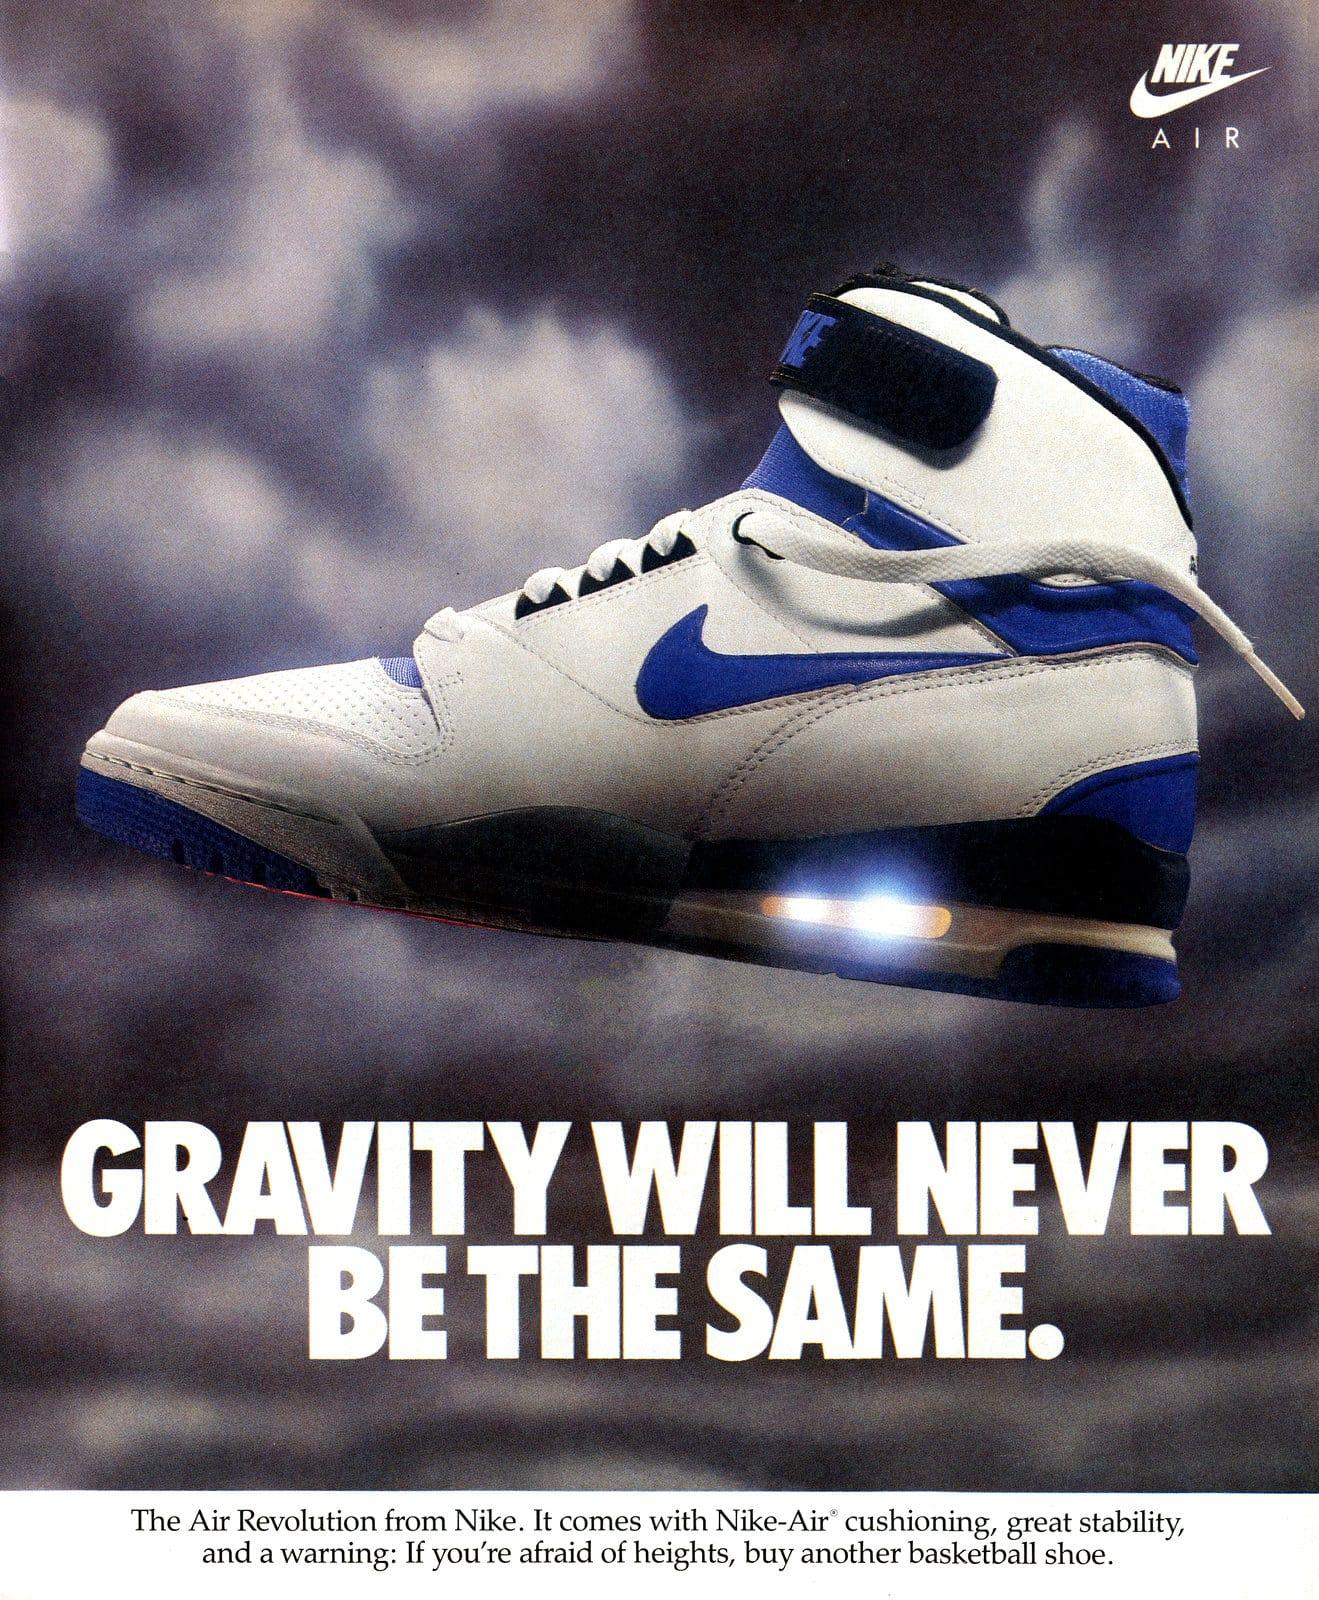 Air Revolution from Nike - Nike Air shoe (1988)